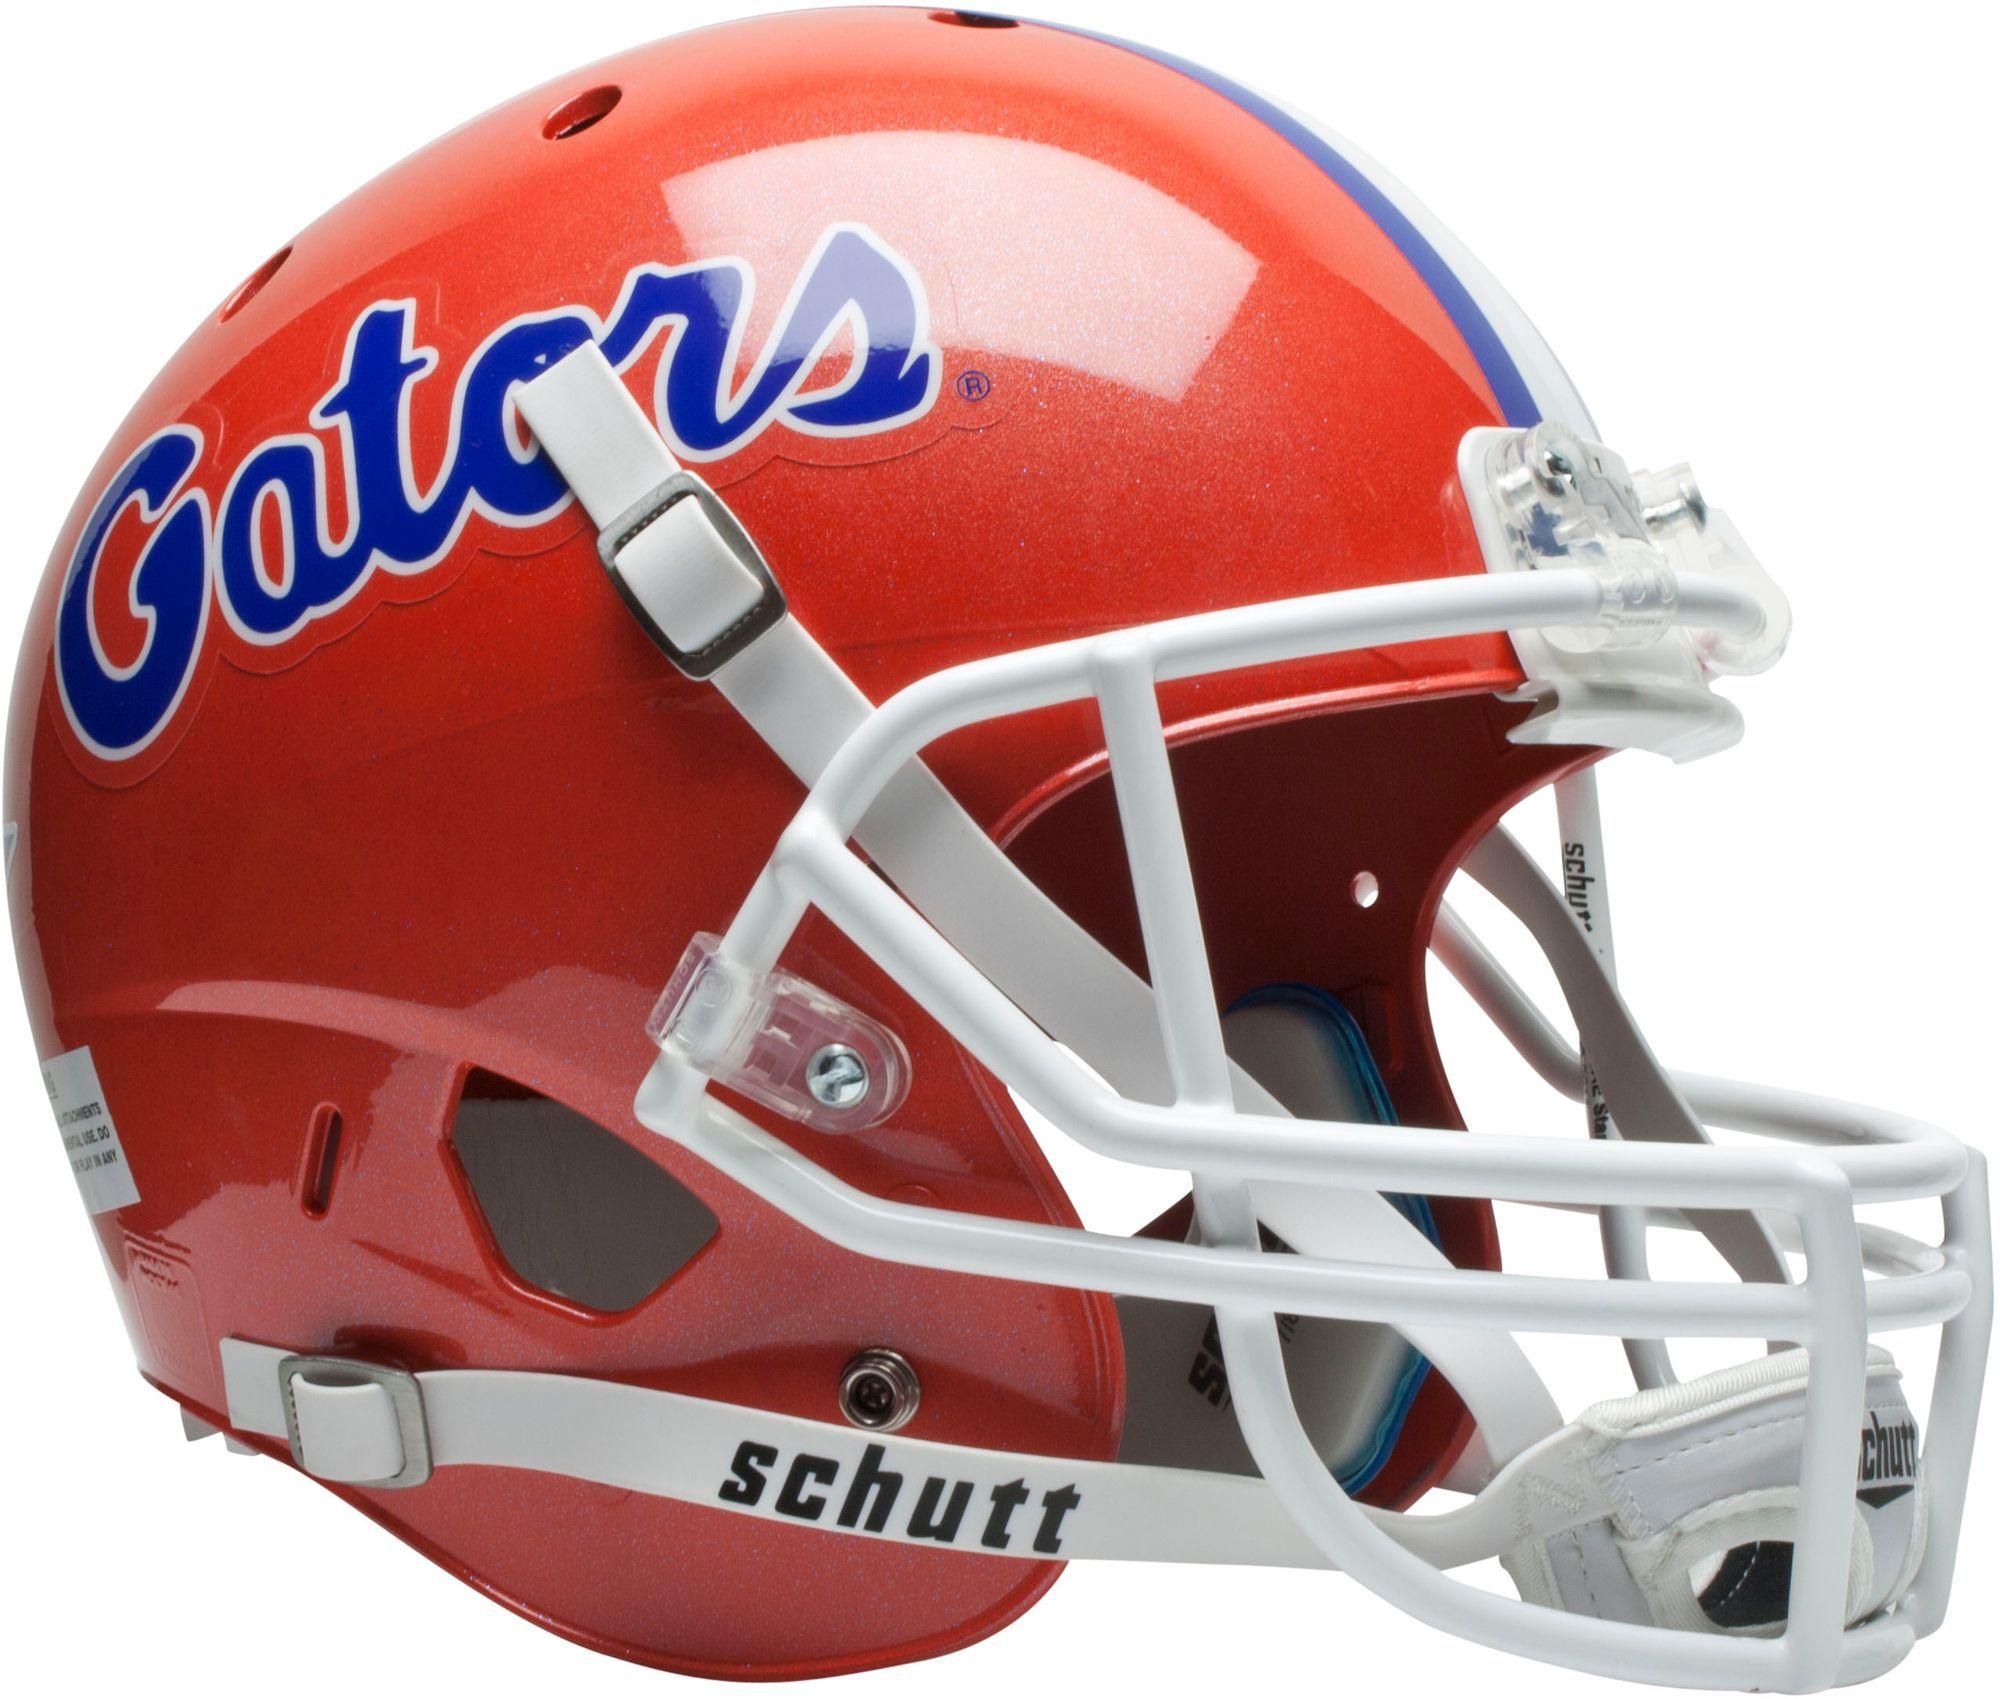 Schutt Florida Gators XP Replica Football Helmet in 2020